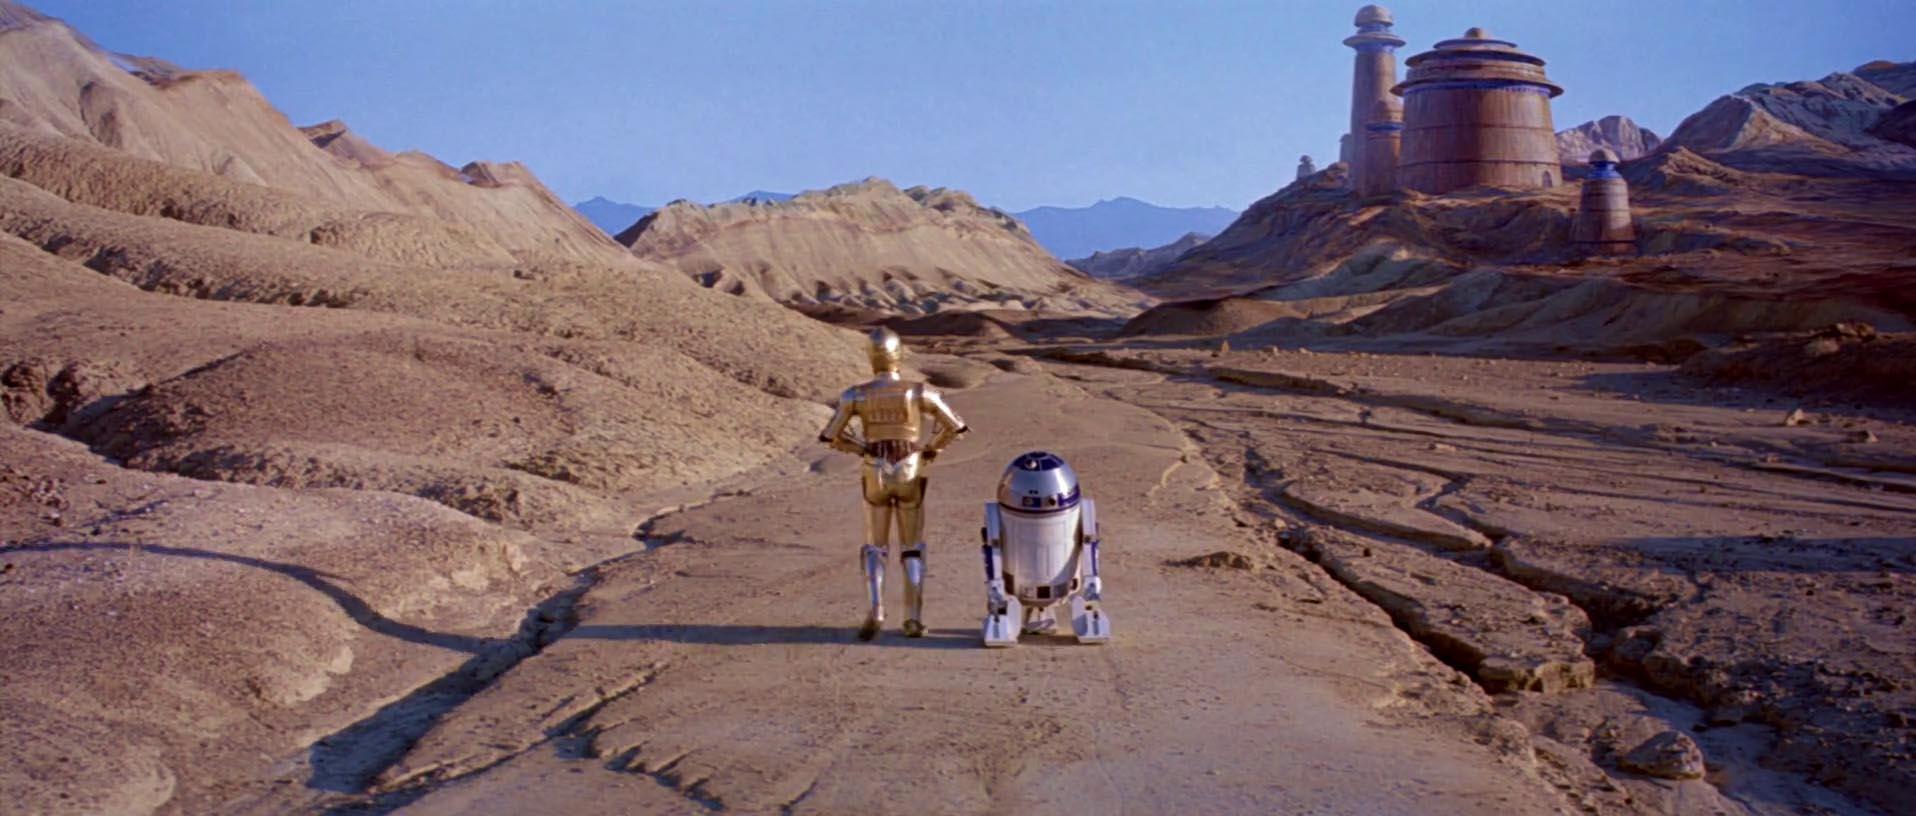 R2d2 And C3po Desert 12 atores que s...